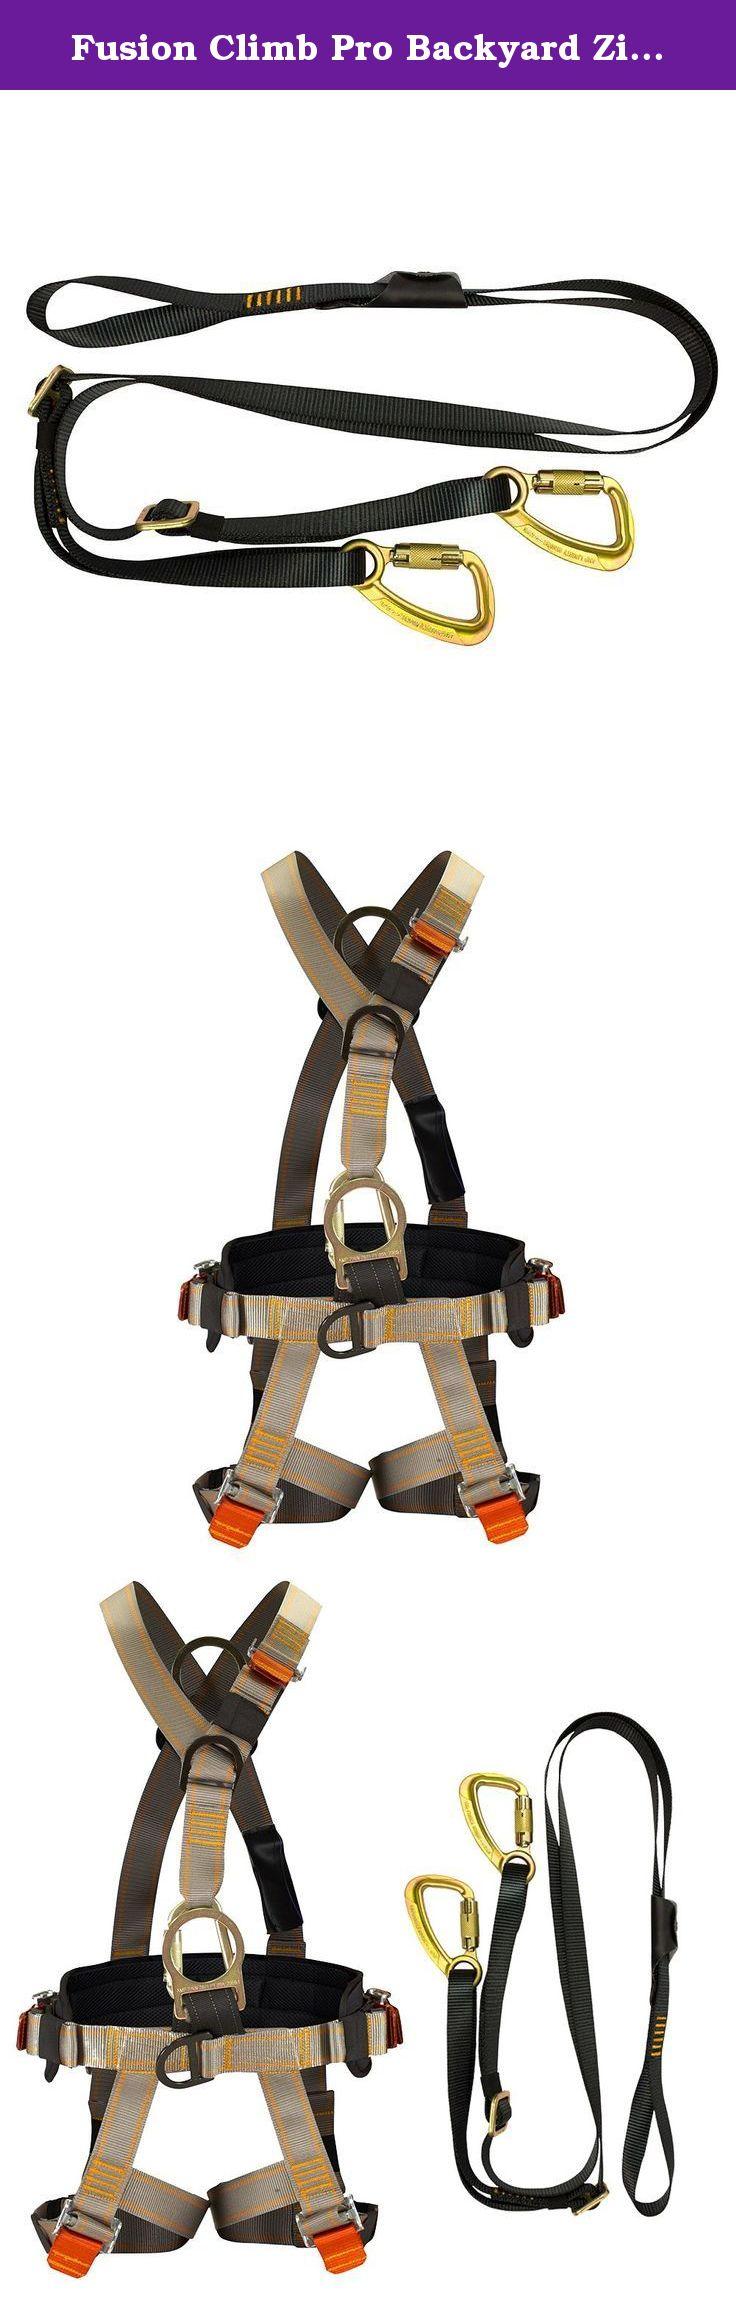 fusion climb pro backyard zip fk a hl 07 line kit harness lanyard